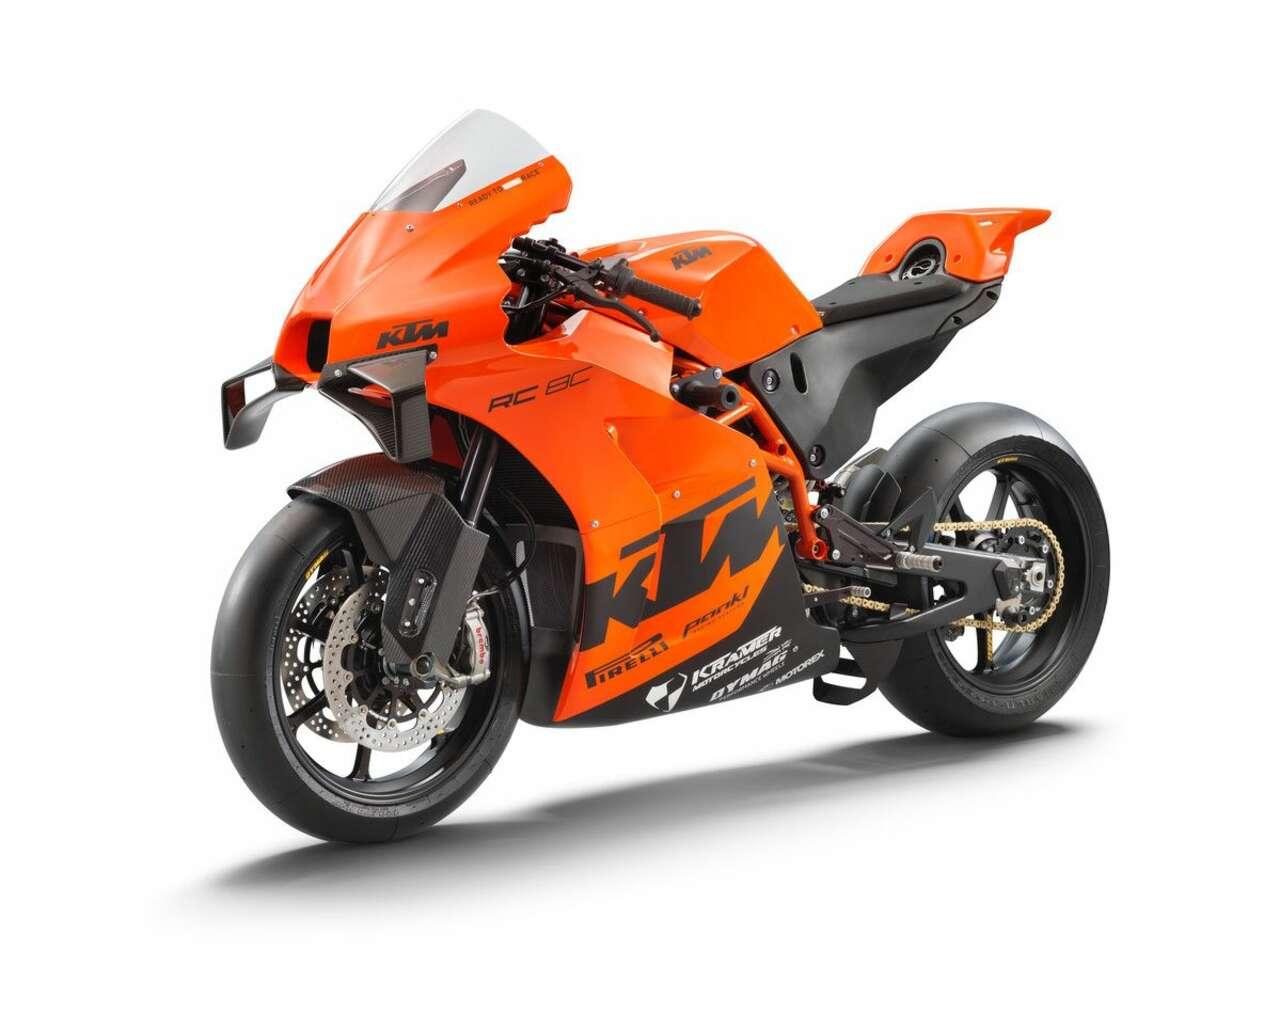 11+ KTM RC 8C Superbike 8 Image